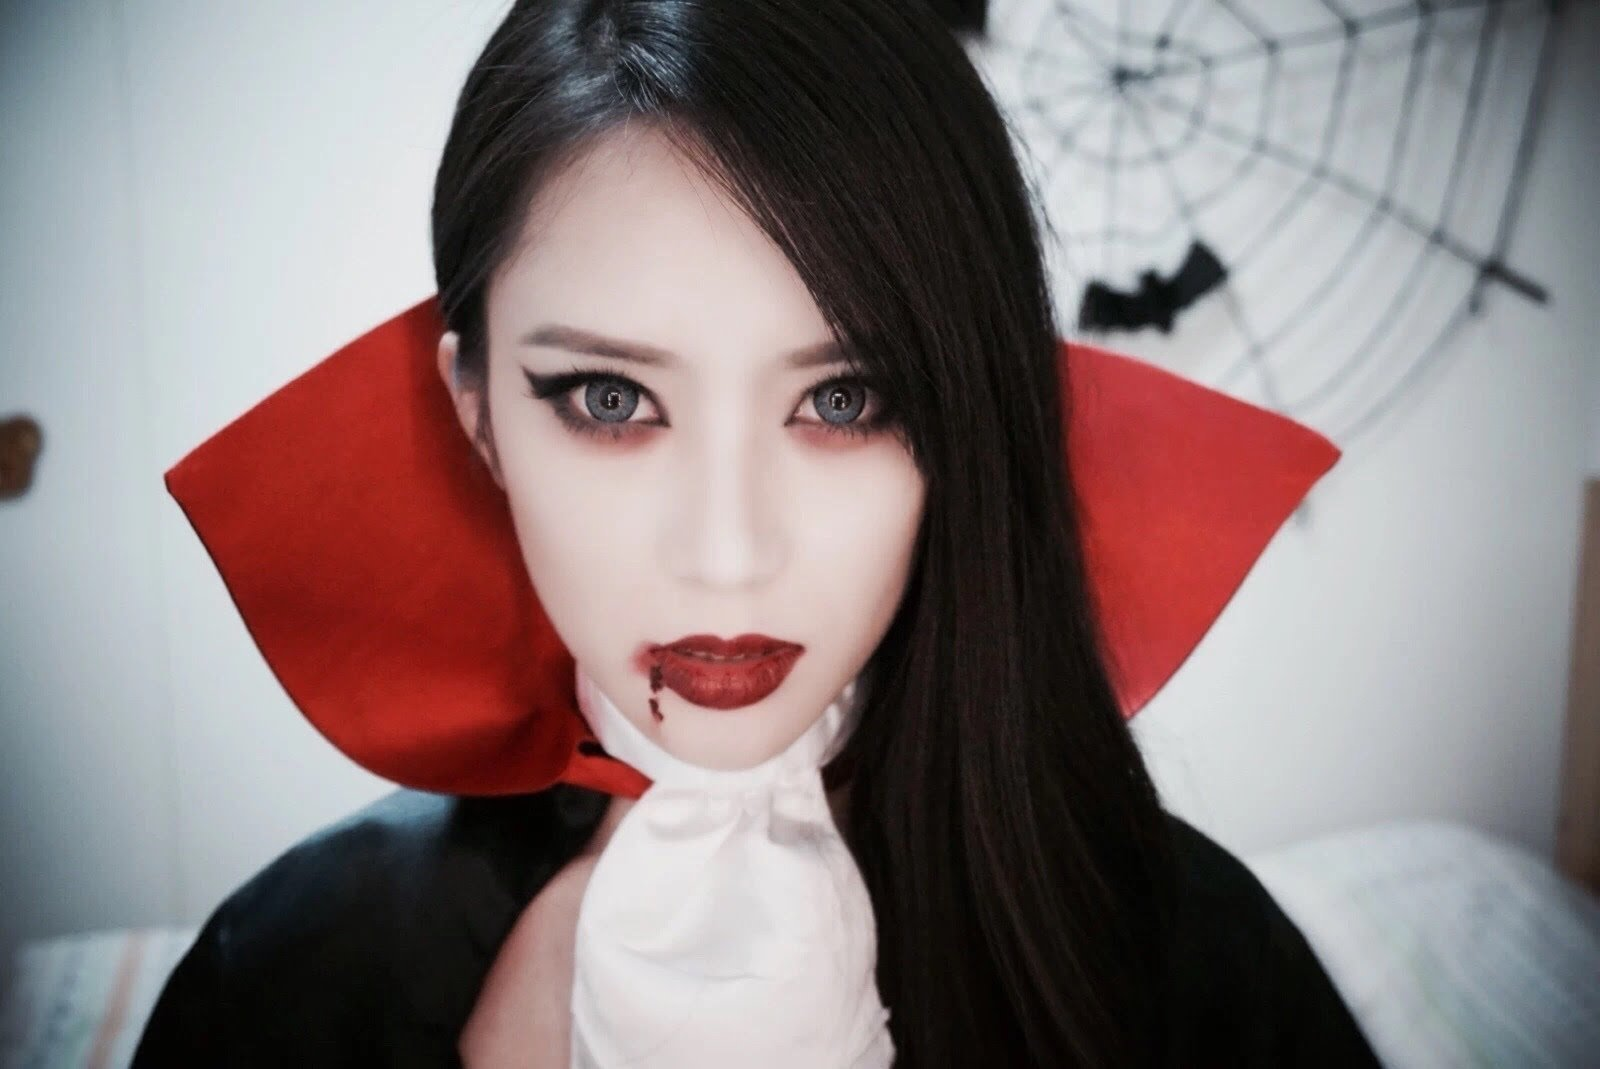 10 Cute Vampire Makeup Ideas For Kids pretty beautiful sexy scary vampire halloween makeup ideas 1 2020